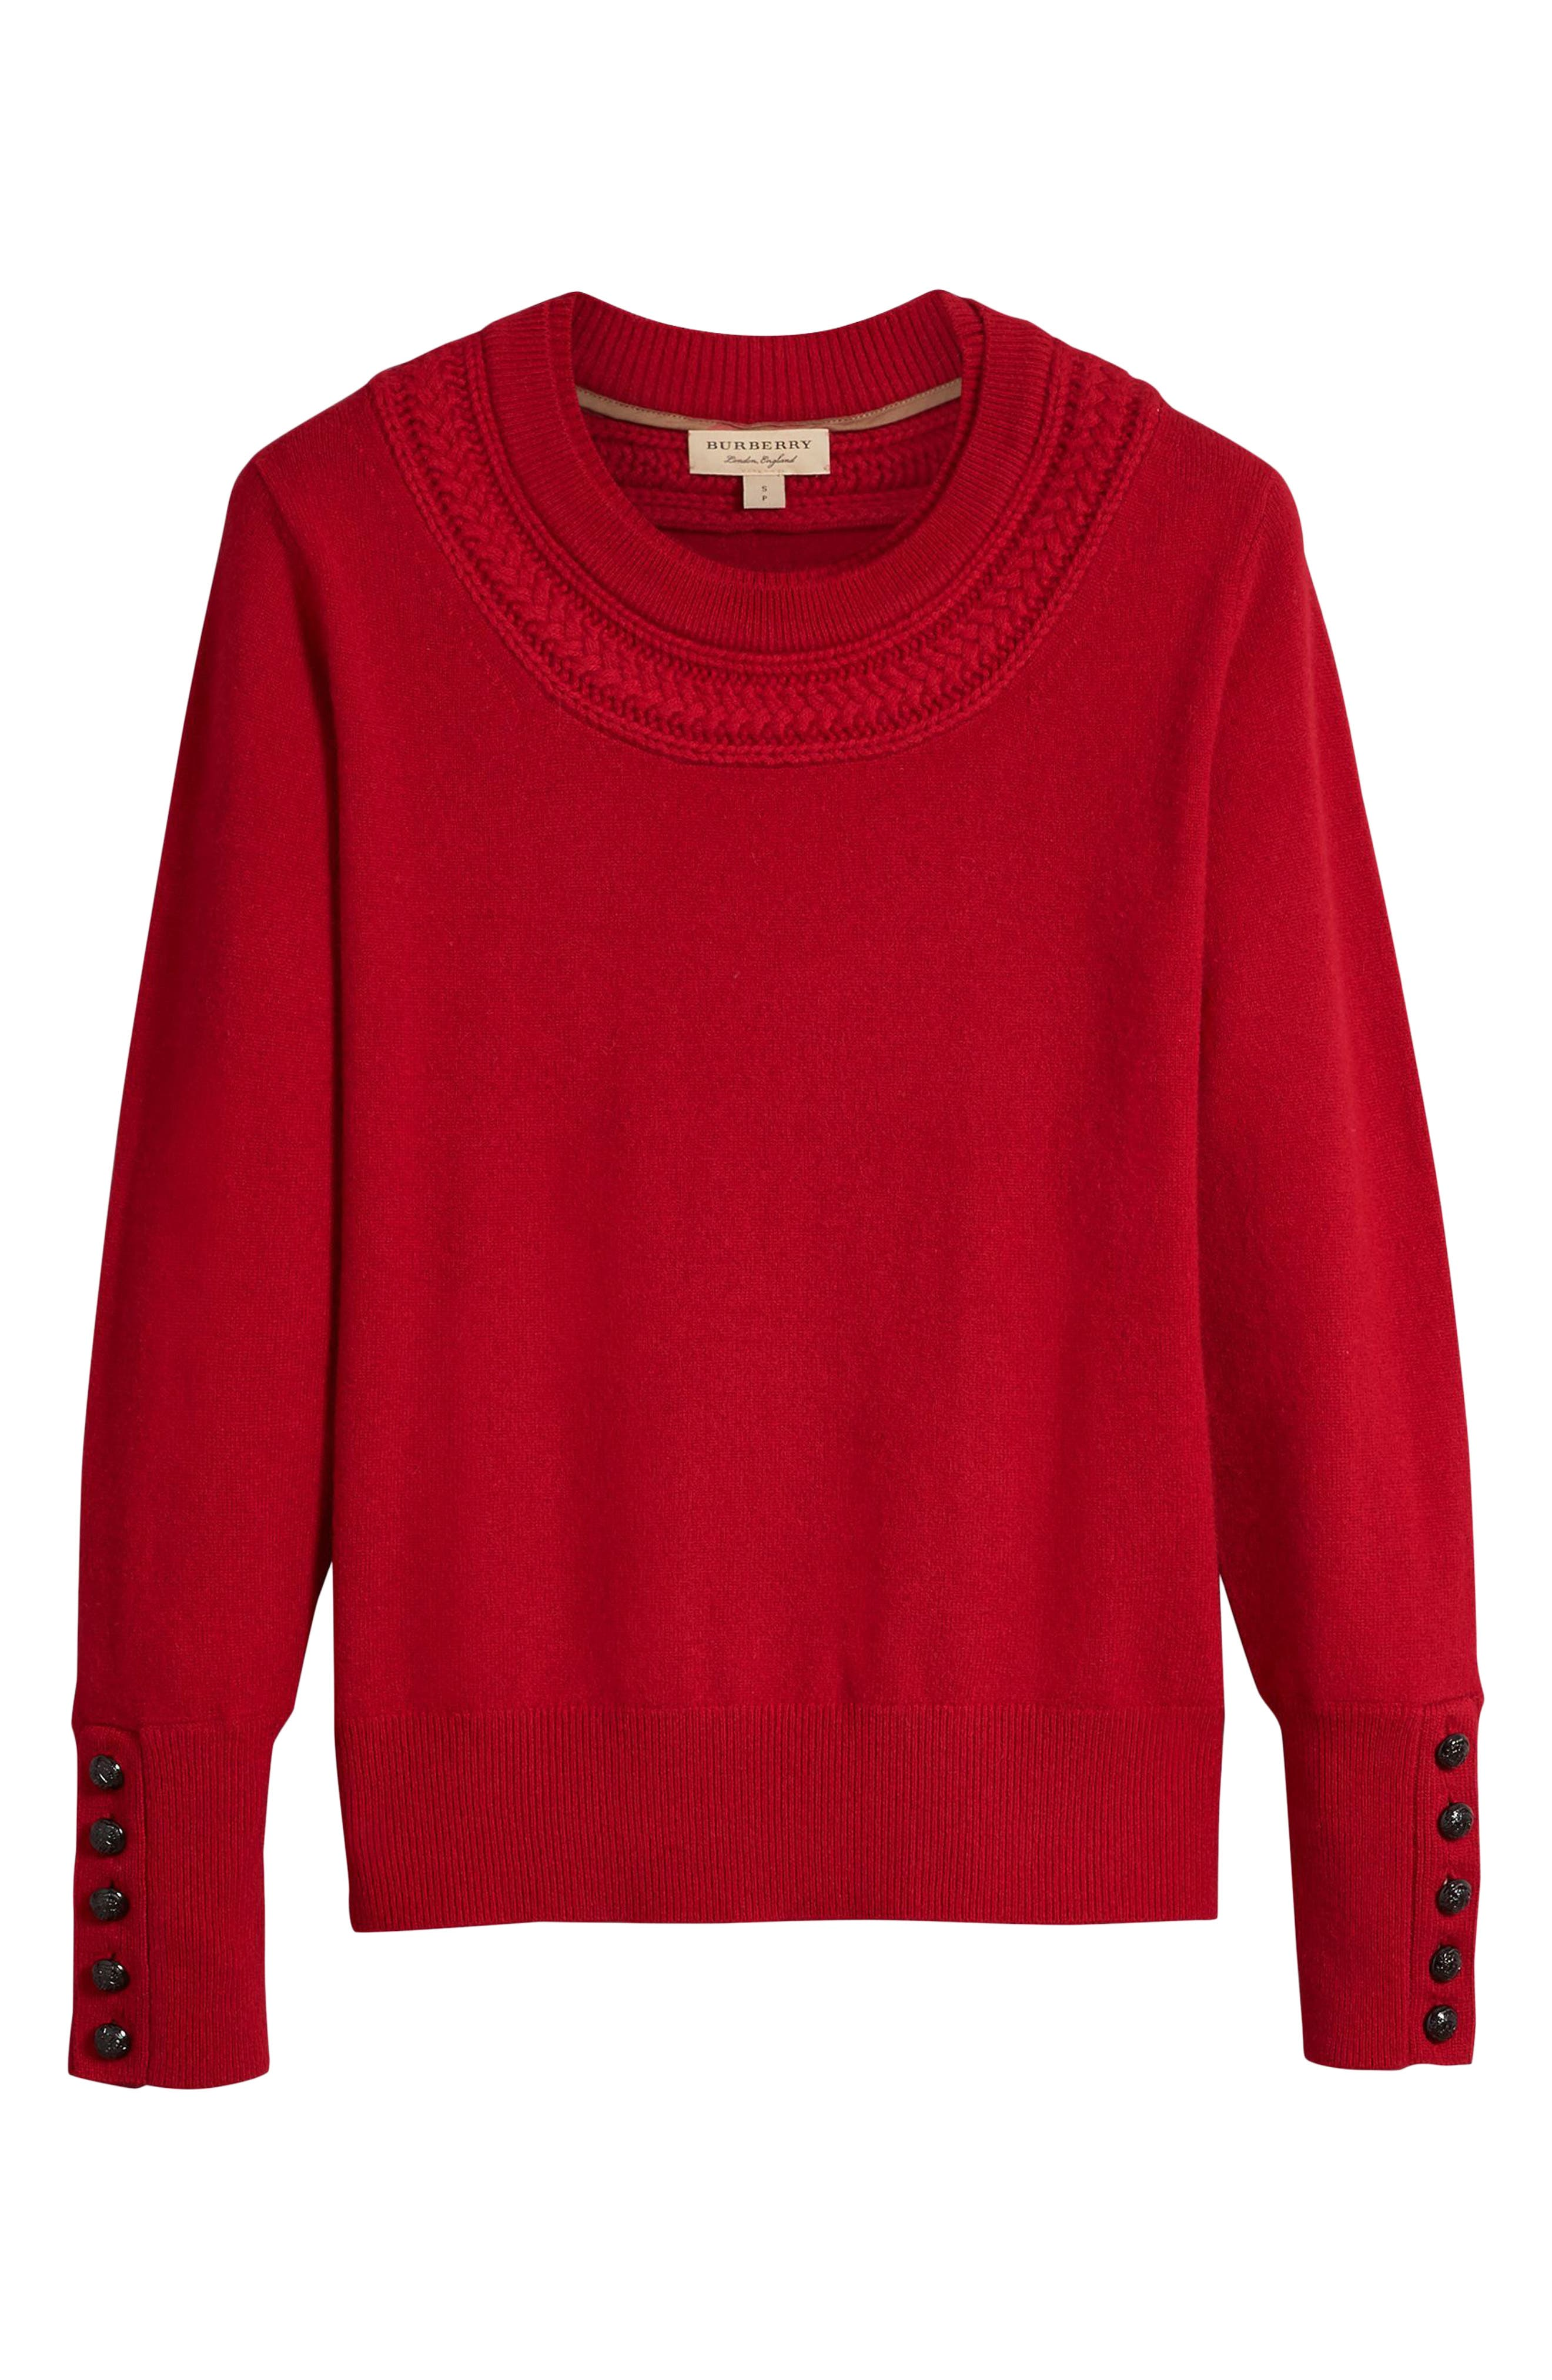 Carapelle Cashmere Sweater,                             Alternate thumbnail 12, color,